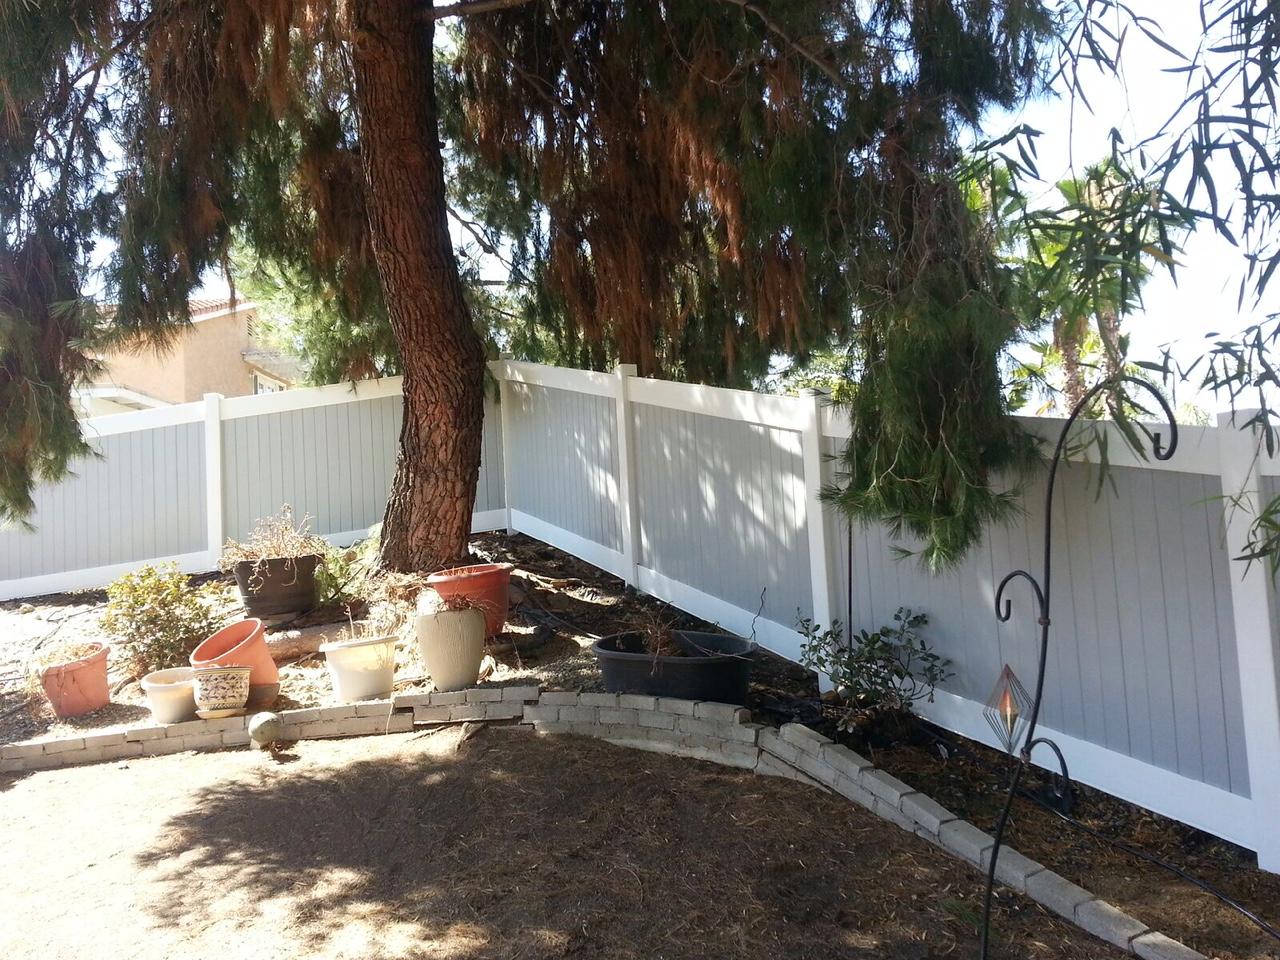 3T Fence image 21